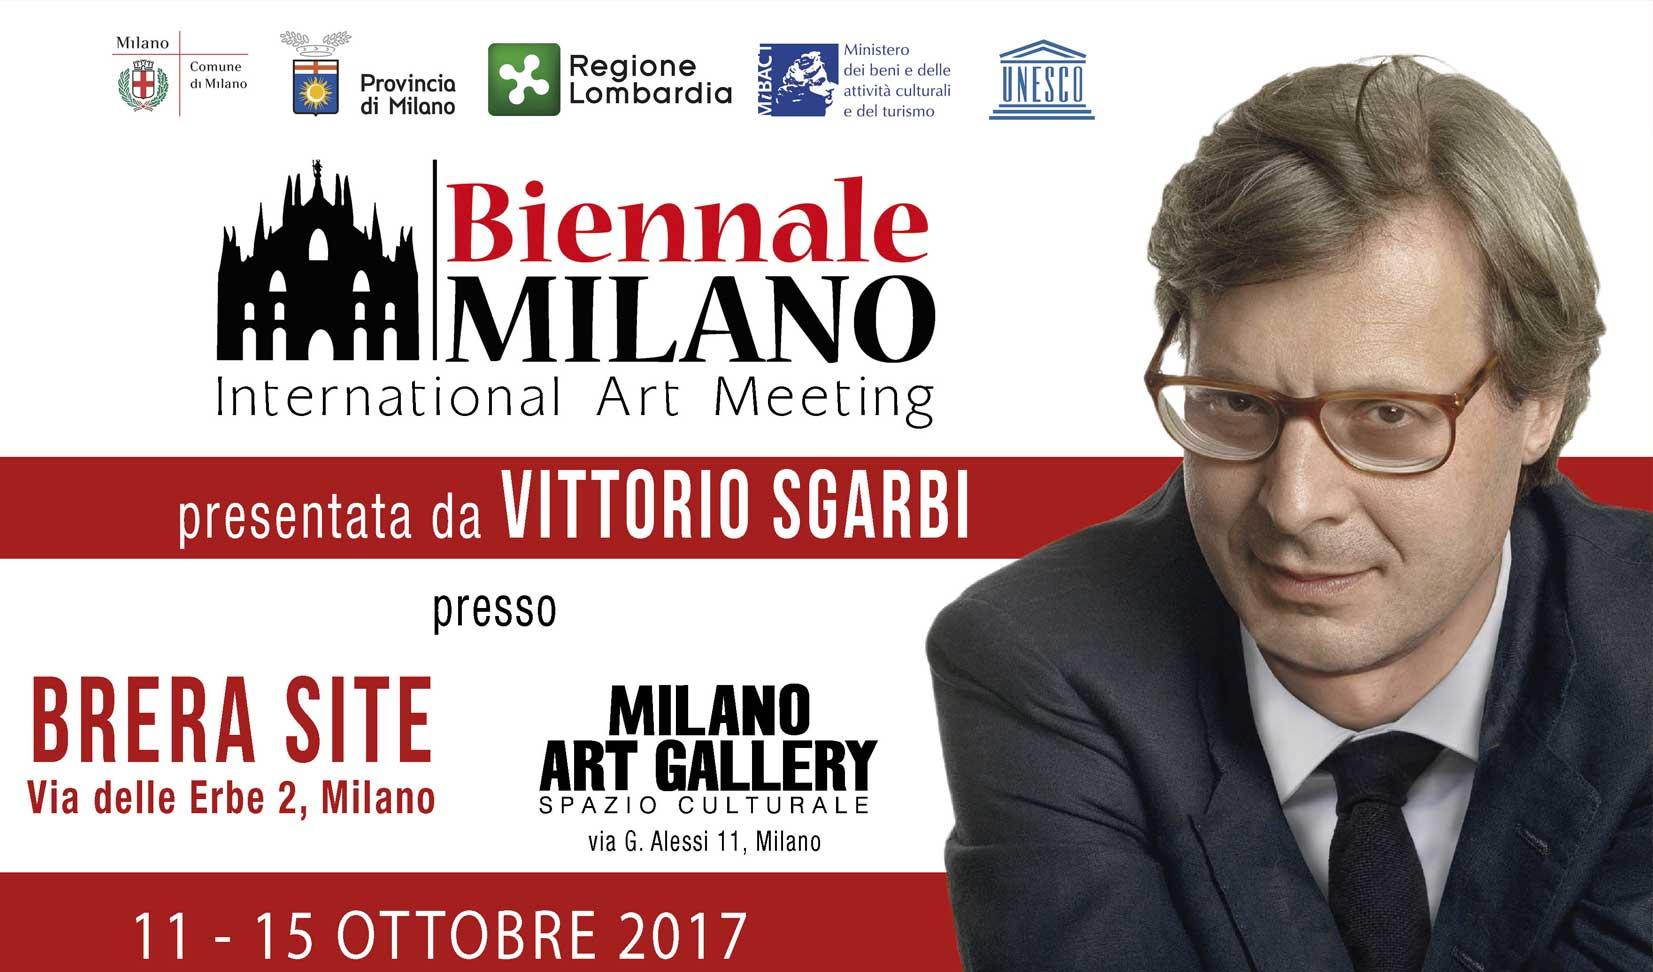 biennale-milano-2017